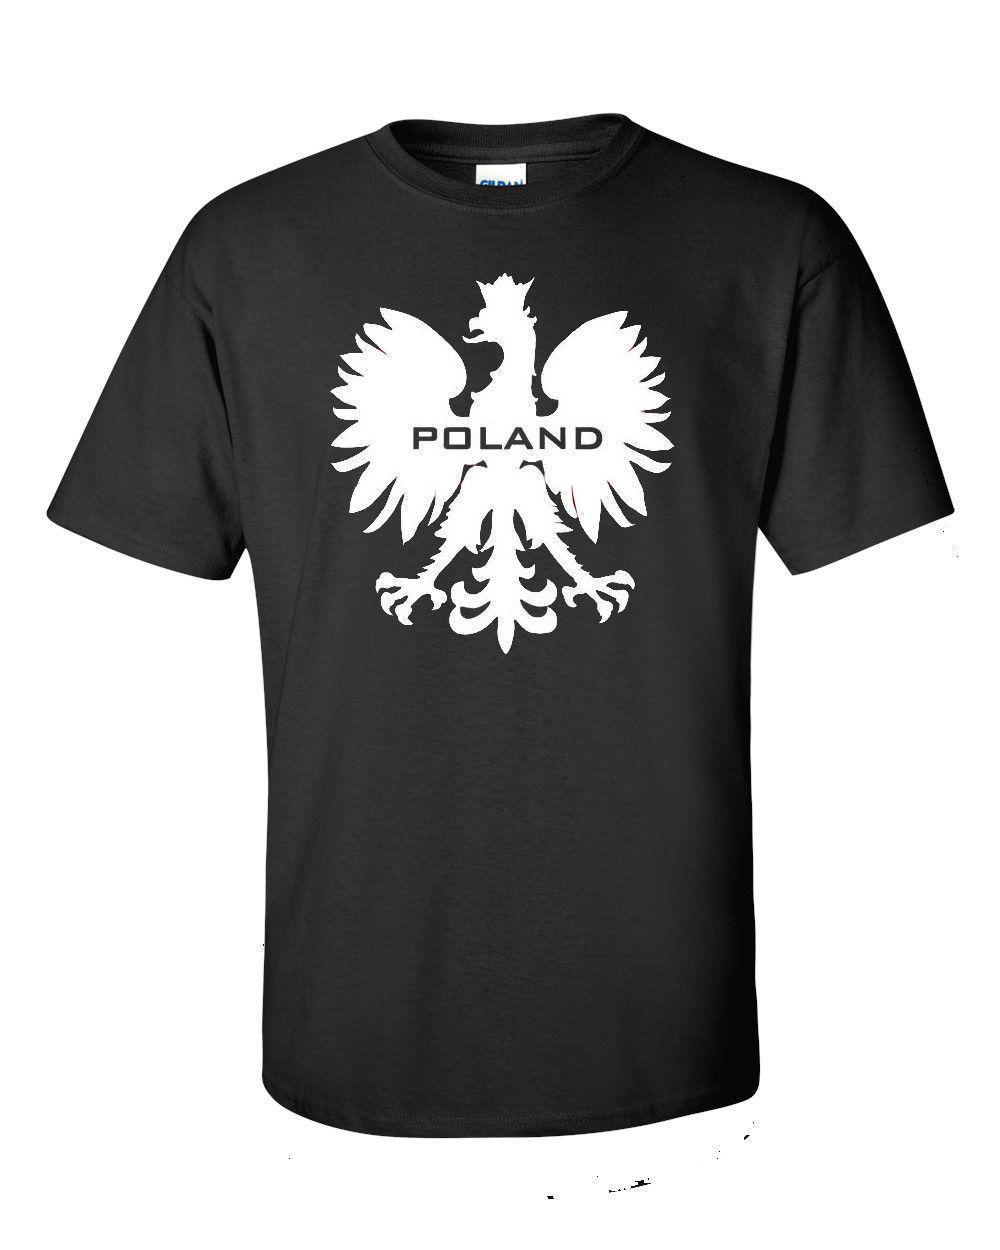 38512d5c Best T Shirts Graphic O Neck Polska Polish Eagle Patriotic Logo Poland T  Shirt Red And Black. Short Sleeve Mens T Shirts Crazy Design Shirts Best  Tee Shirt ...